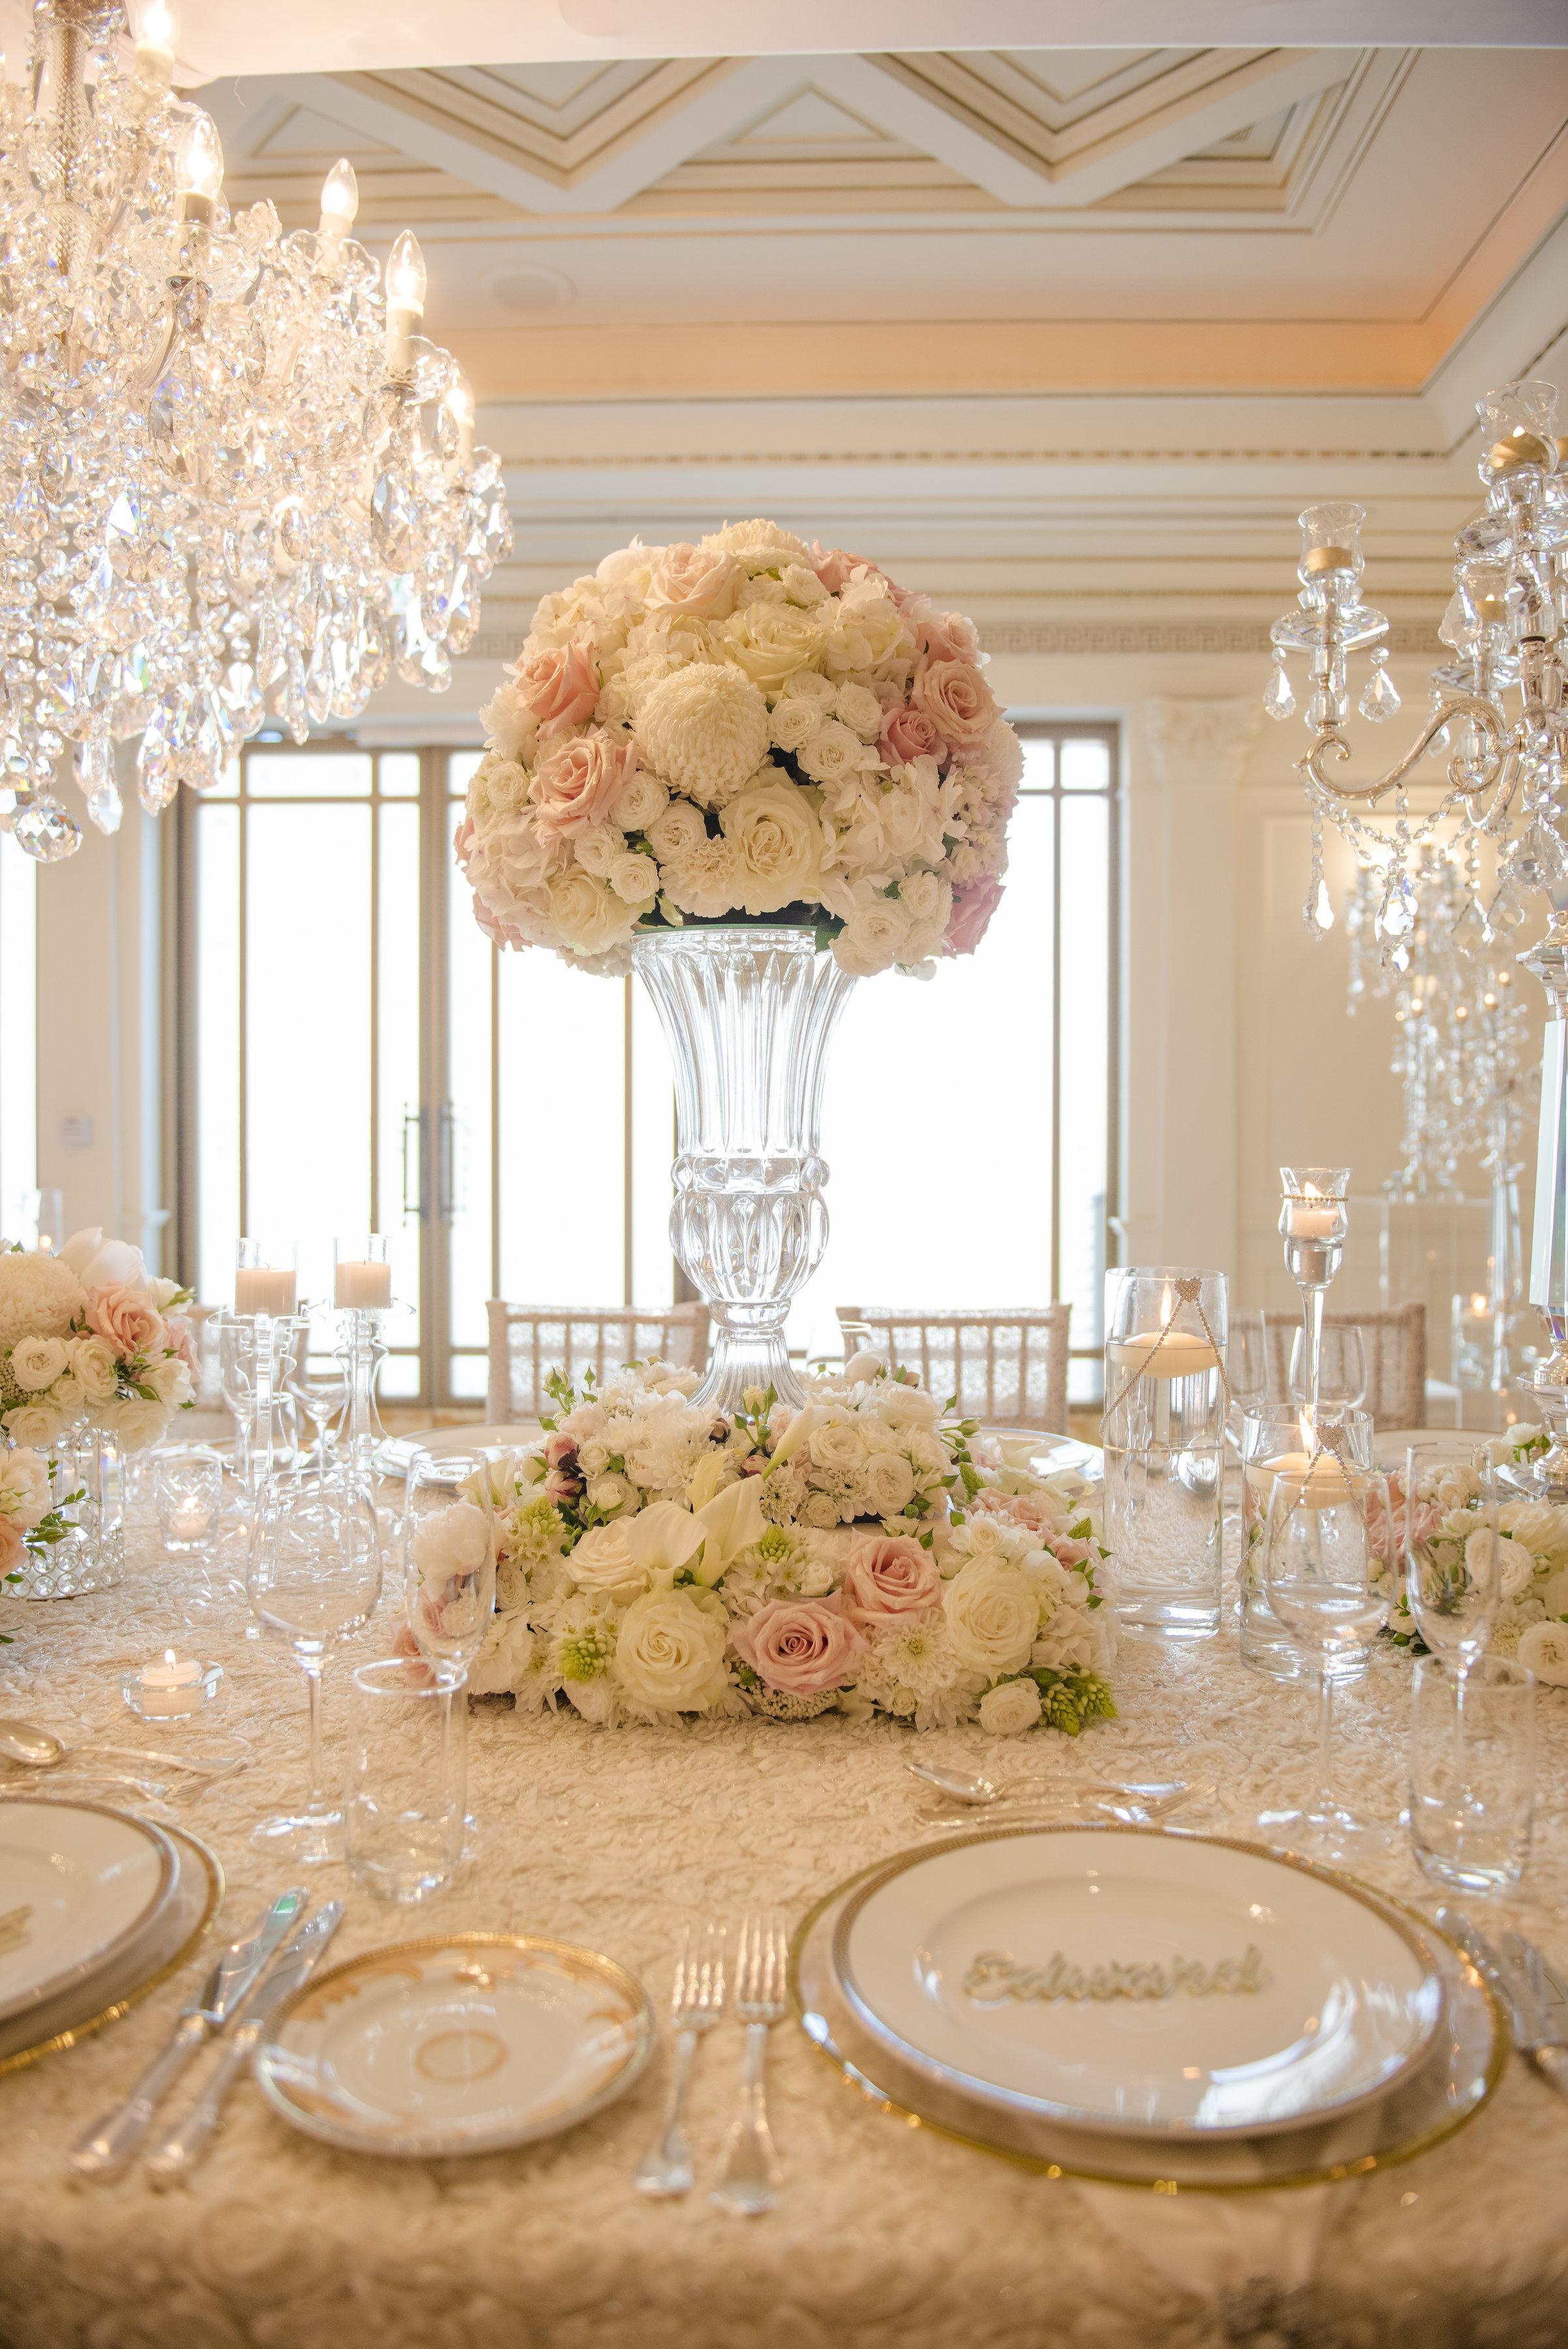 Hire_Ivory_rose_luxury_linen_sydney_wedding_decor_event_Versace_Decor_centrepeice_flowers_pink_white .jpg